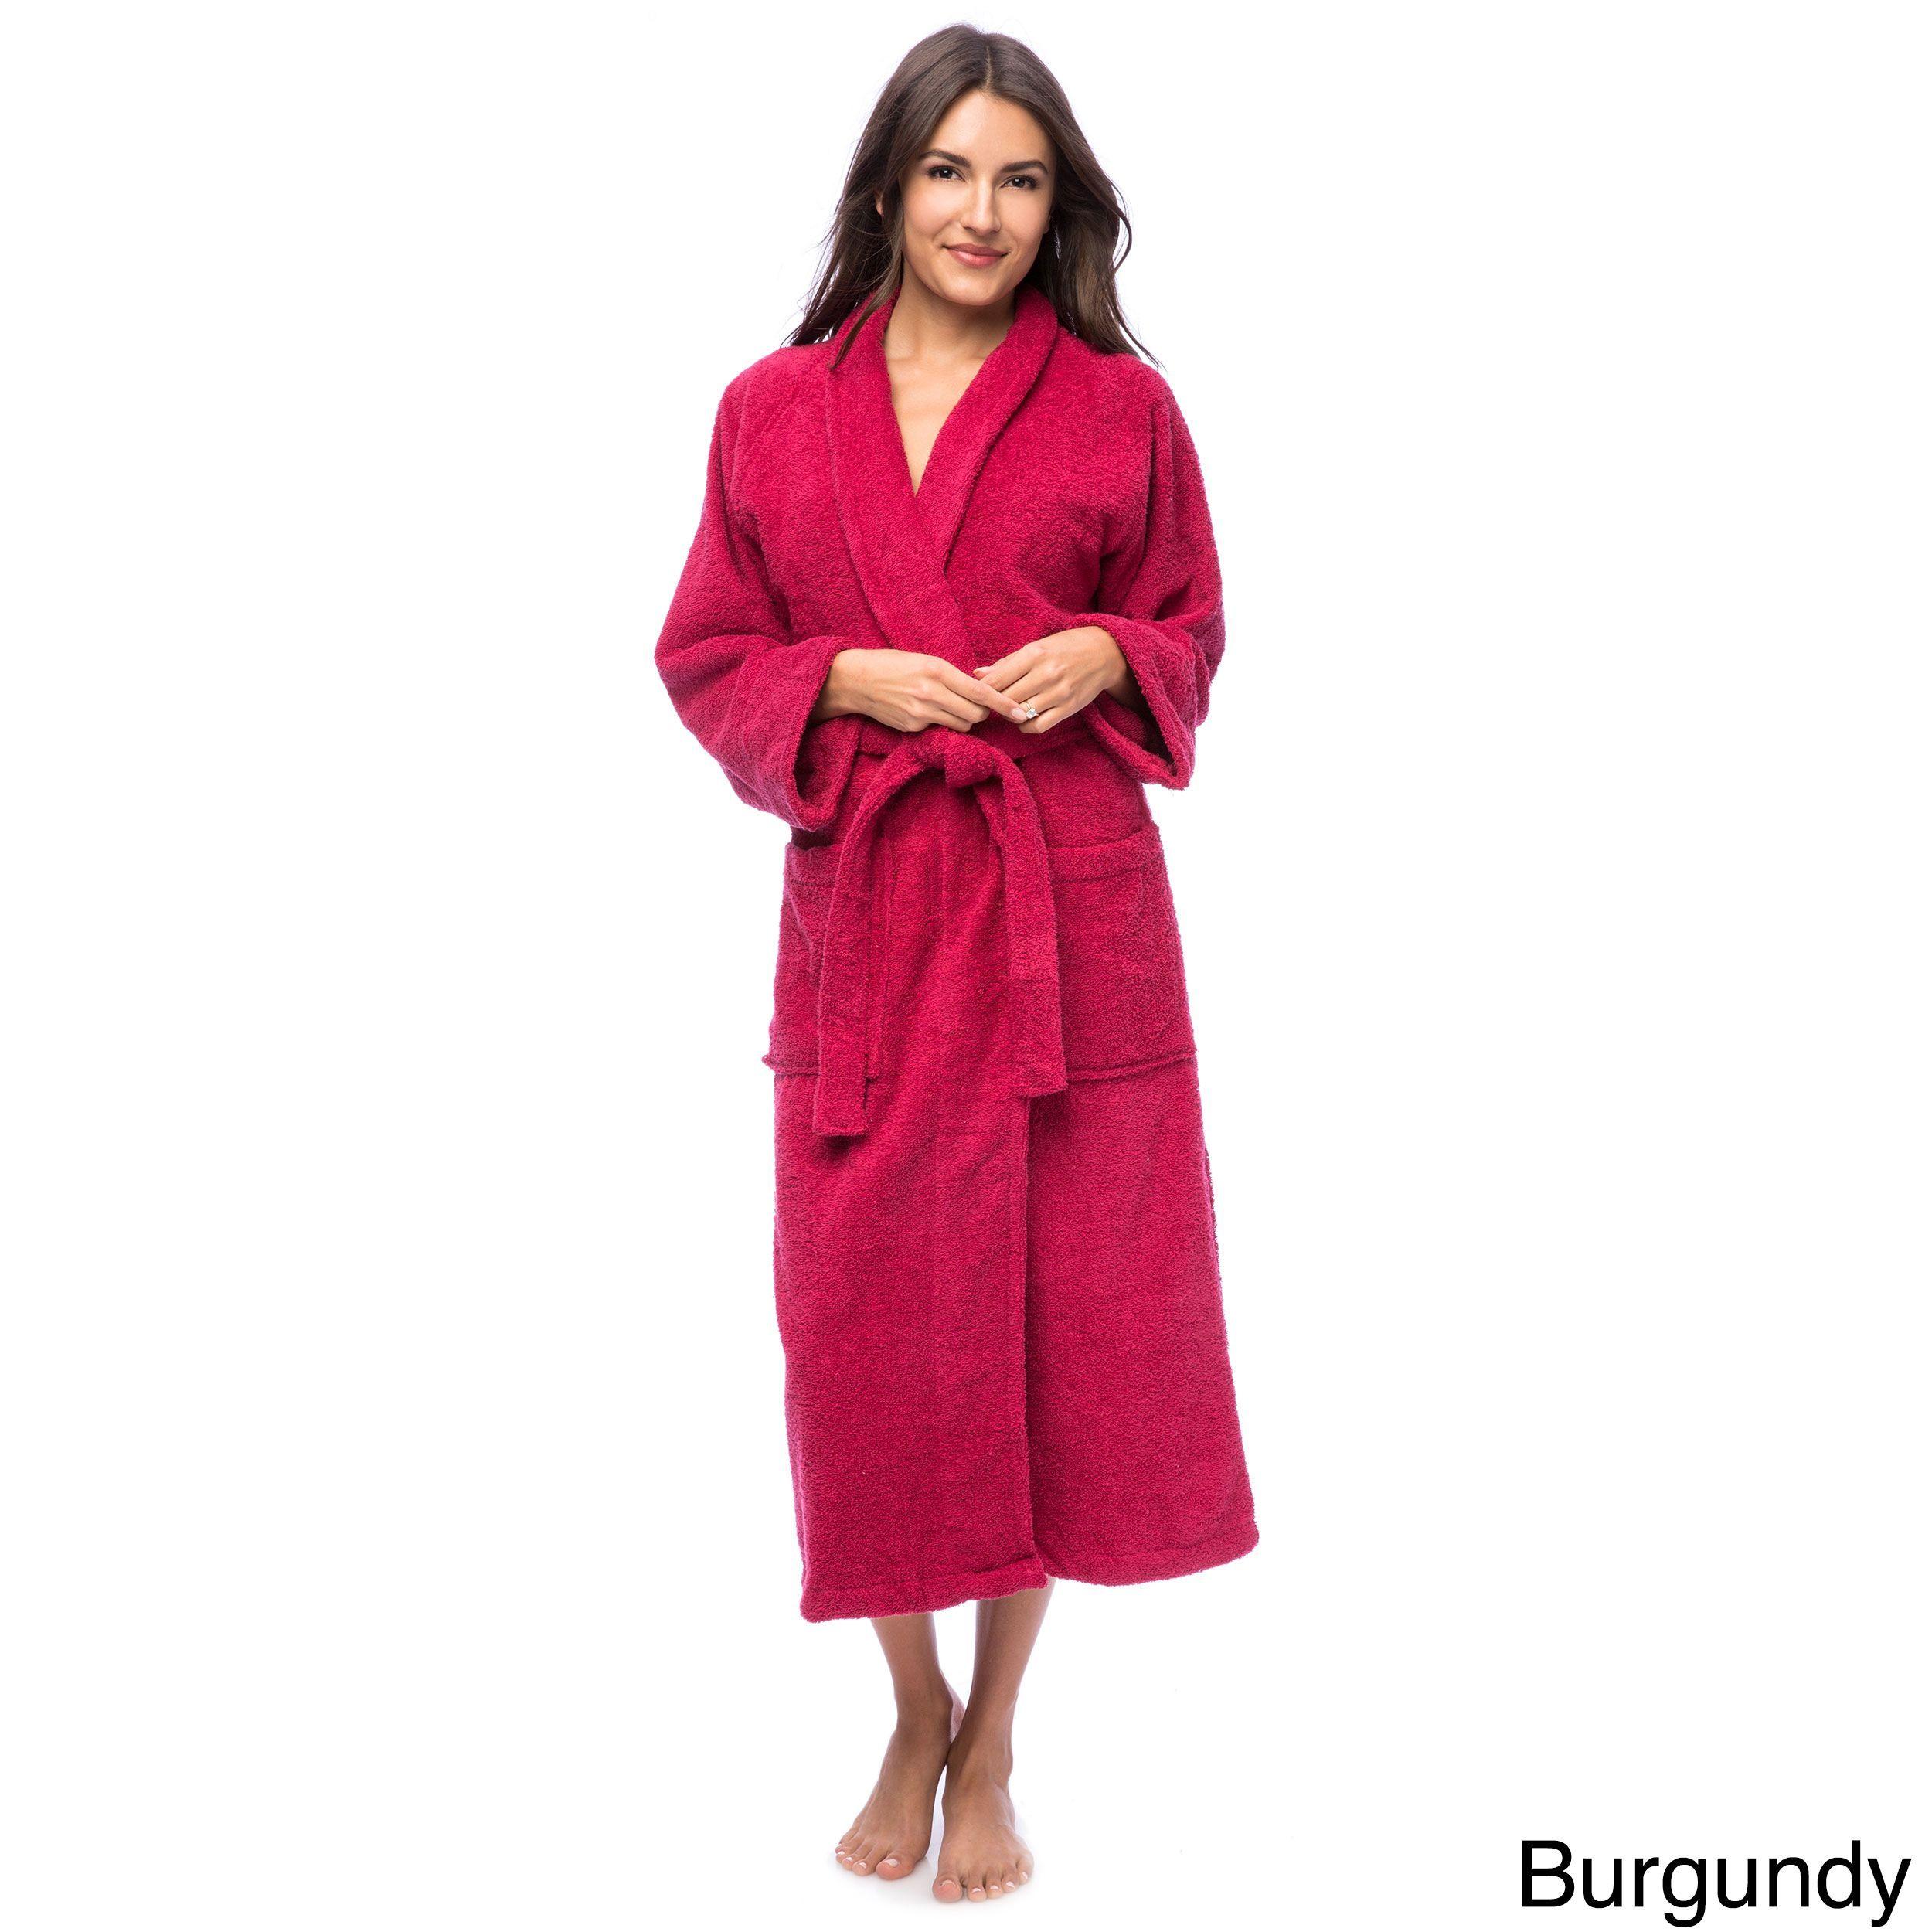 88891980d1 Superior Collection Luxurious Egyptian Cotton Unisex Terry Bath Robe ...